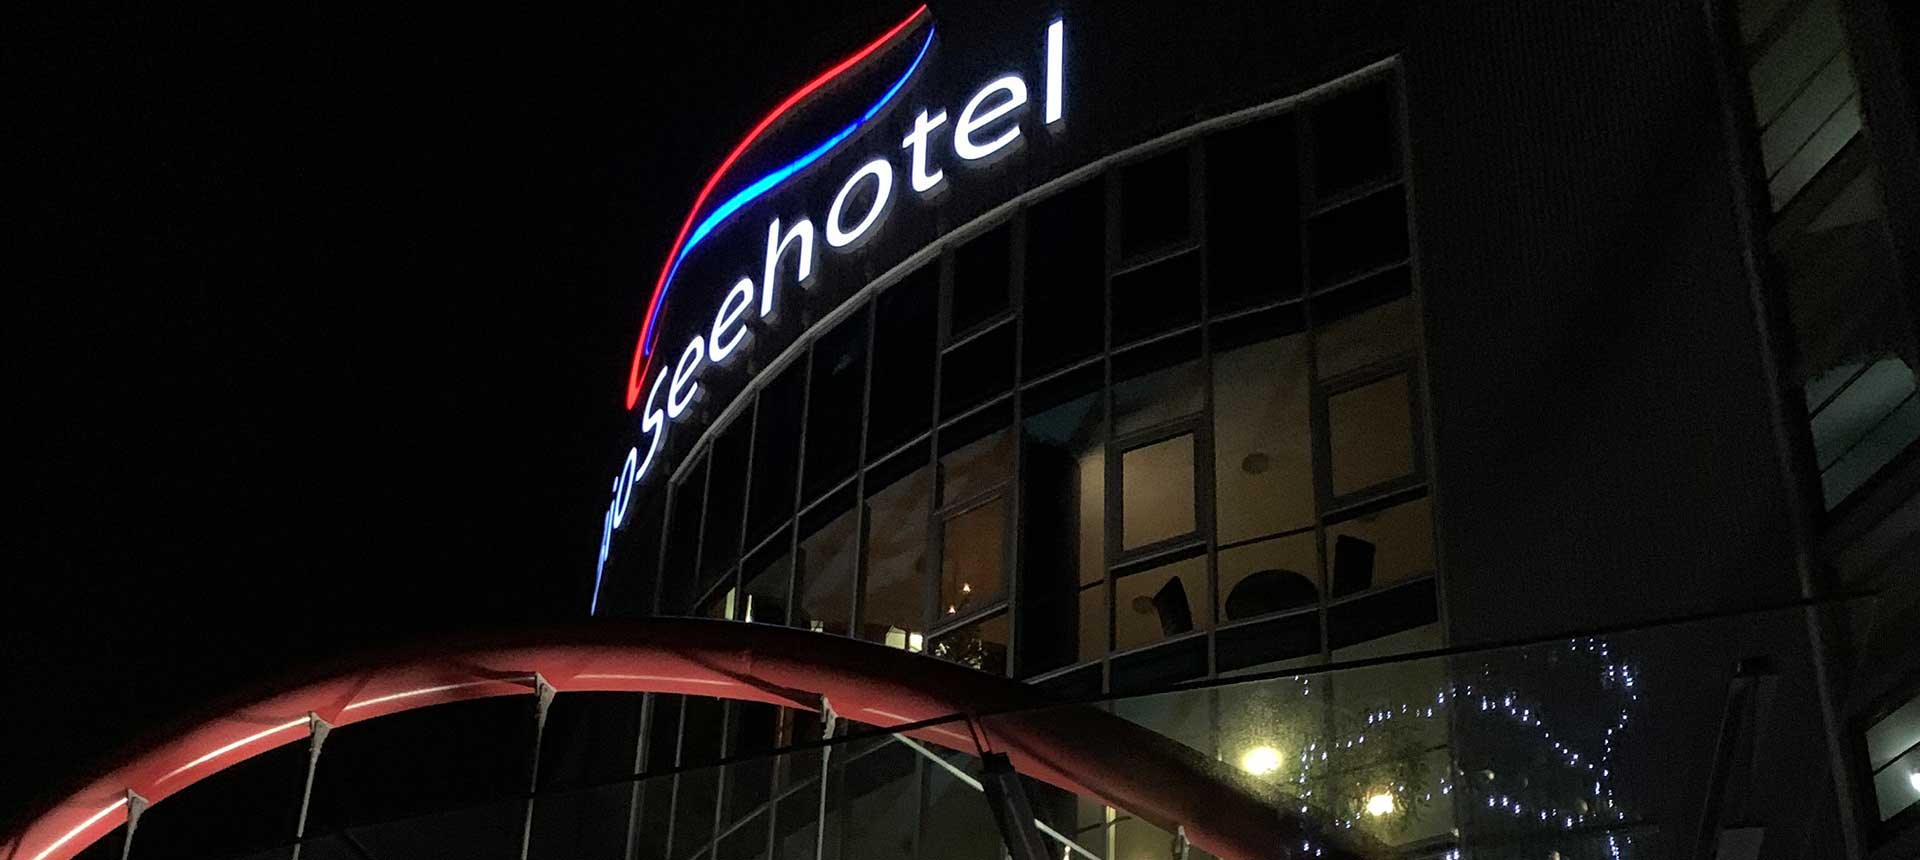 BioSee-Hotel-Zeulenroda-01